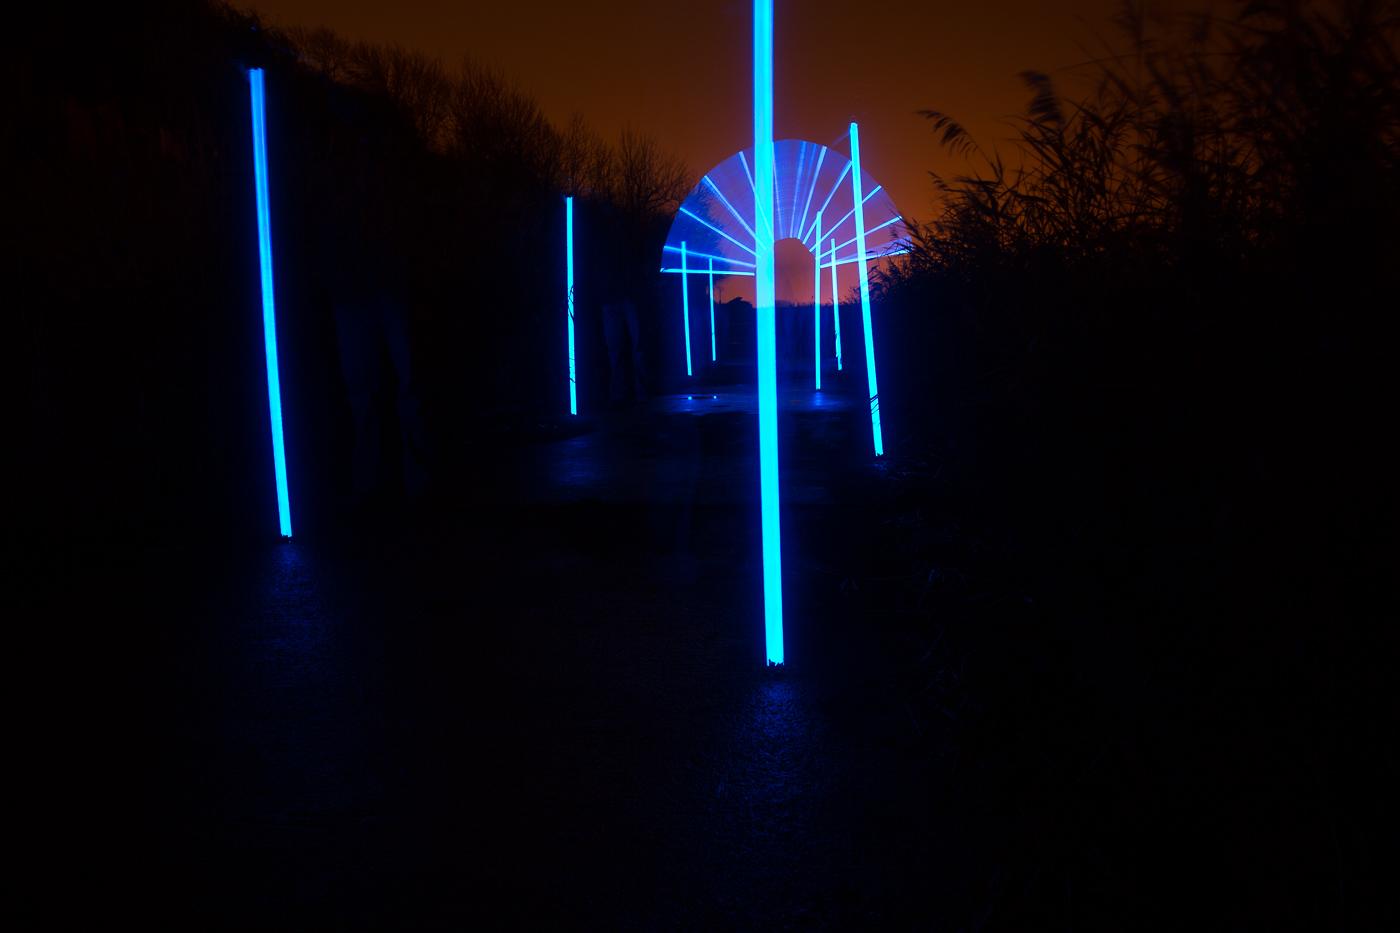 Blue Rods